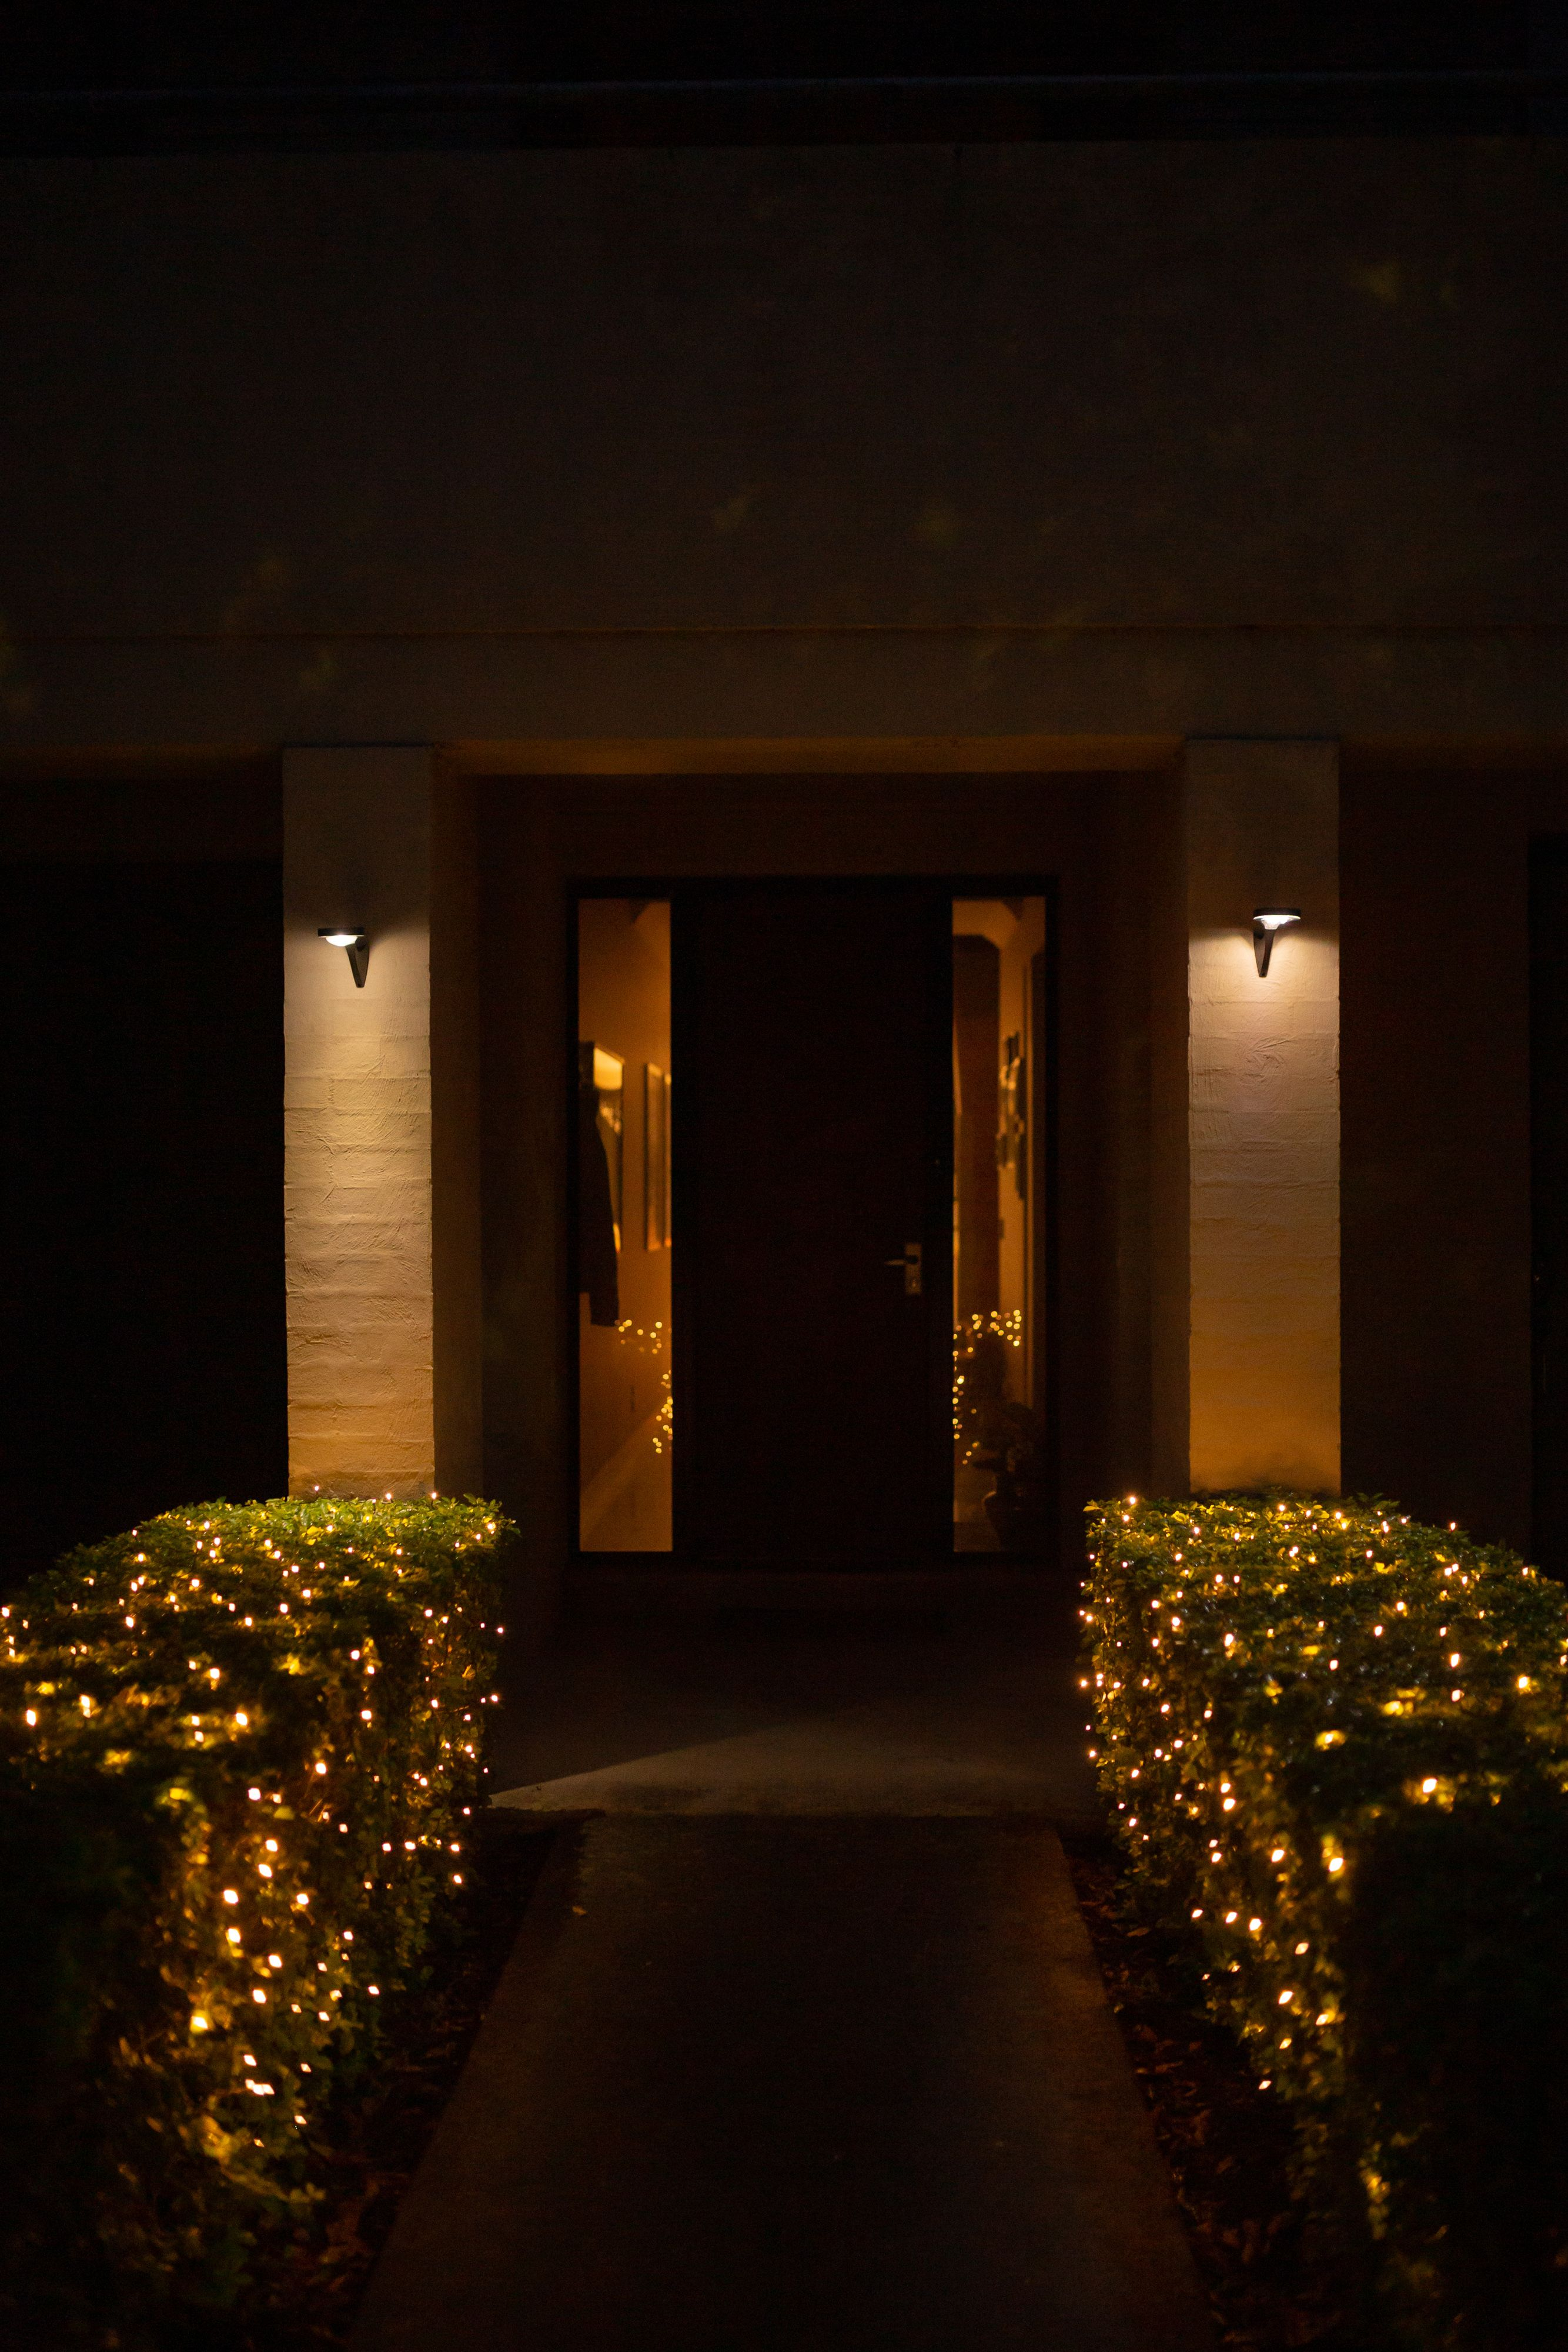 Garden Night Light Magic With Hoselink Solar Lights Garden Garden Night Lighting Solar Wall Lights